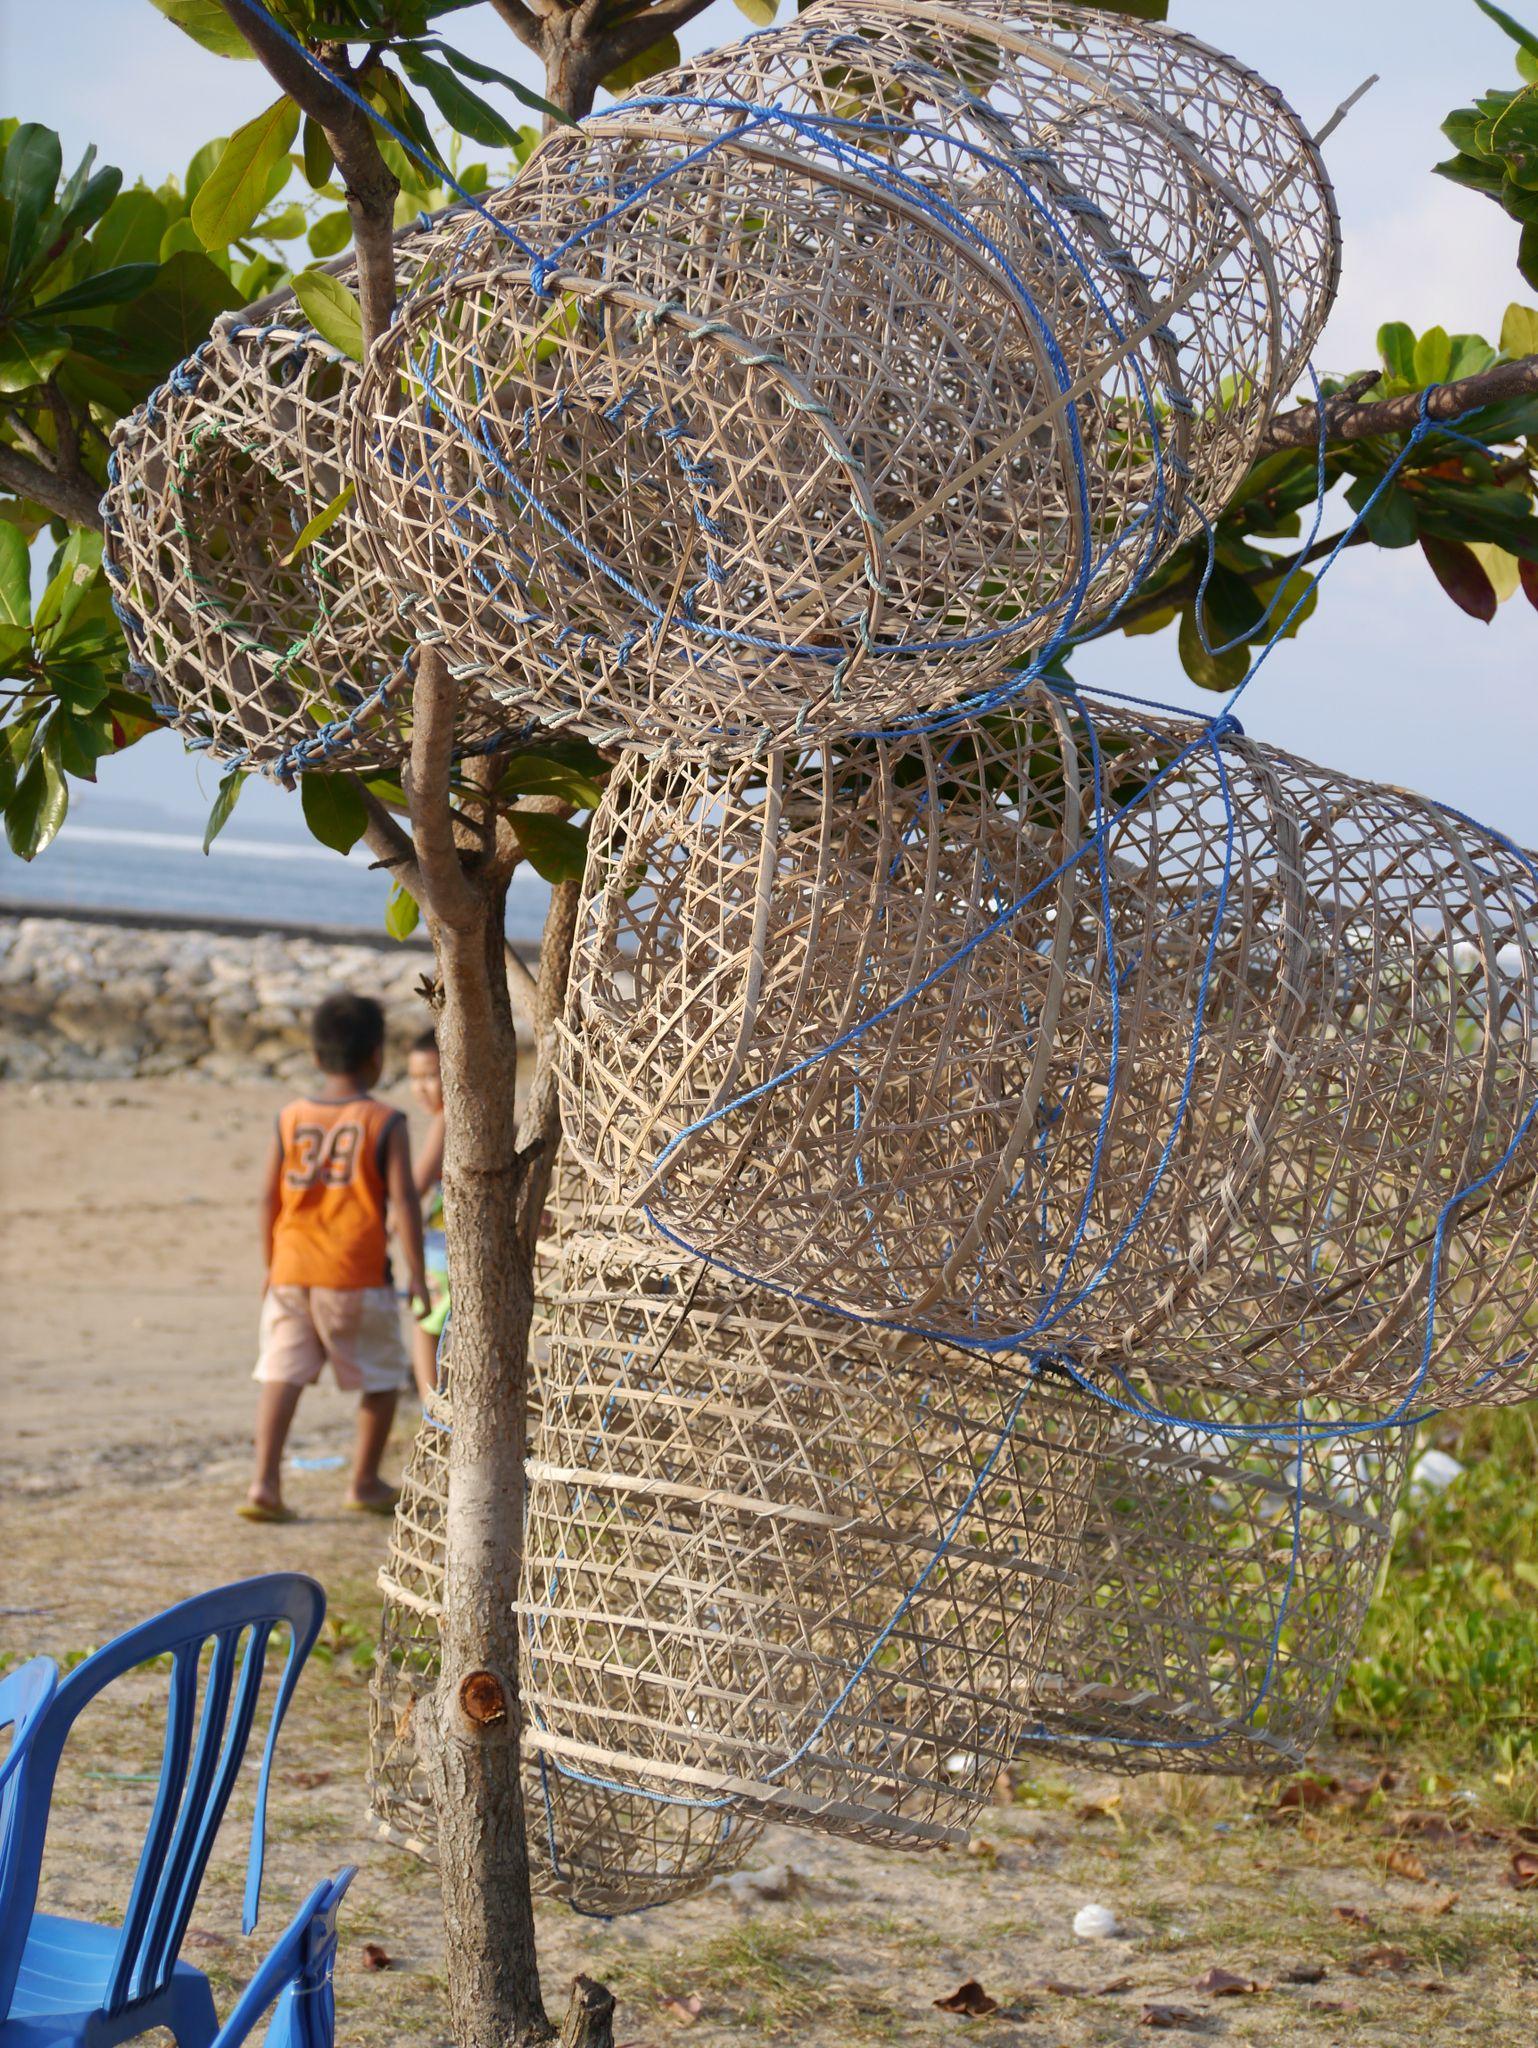 Fishing baskets on Nusa Dua beach Bali